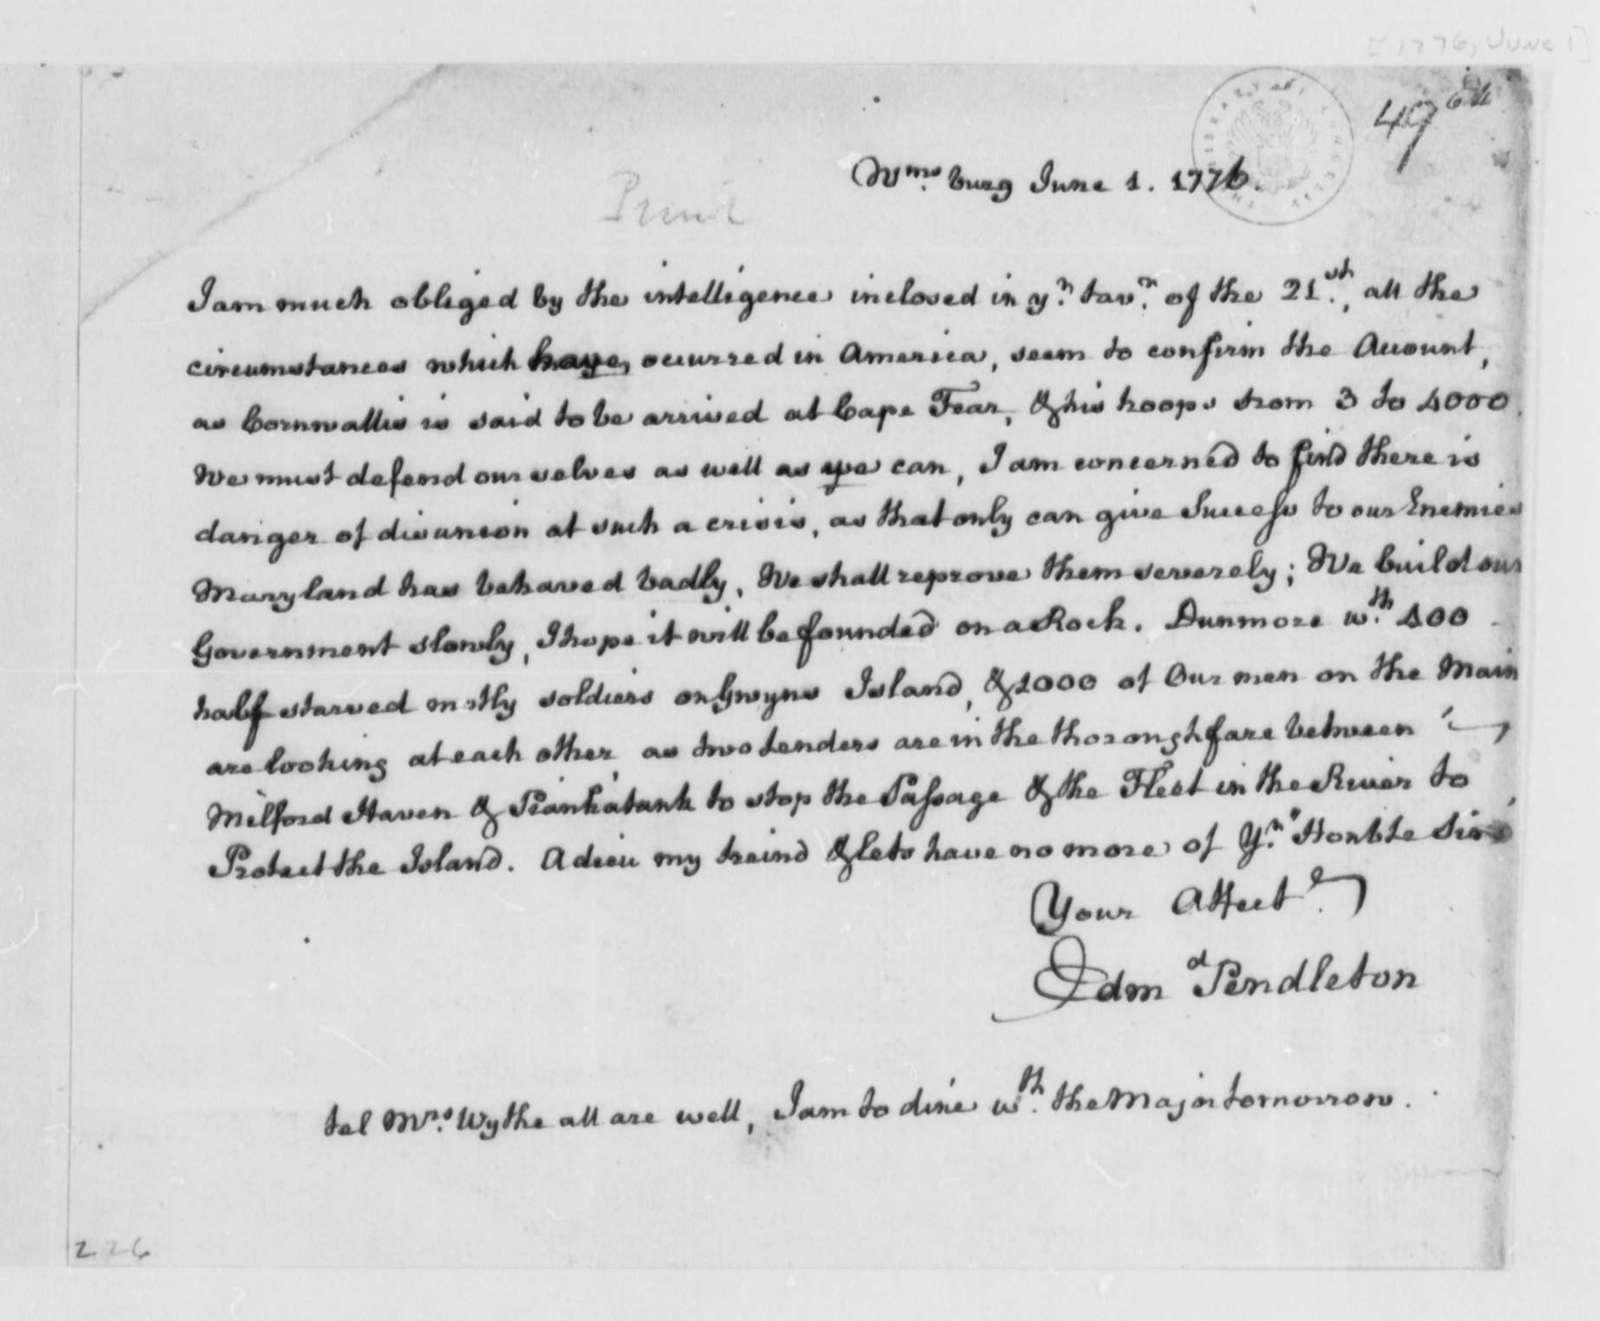 Edmund Pendleton to Thomas Jefferson, June 1, 1776, Report of Cornwallis at Cape Fear; Naval Intelligence